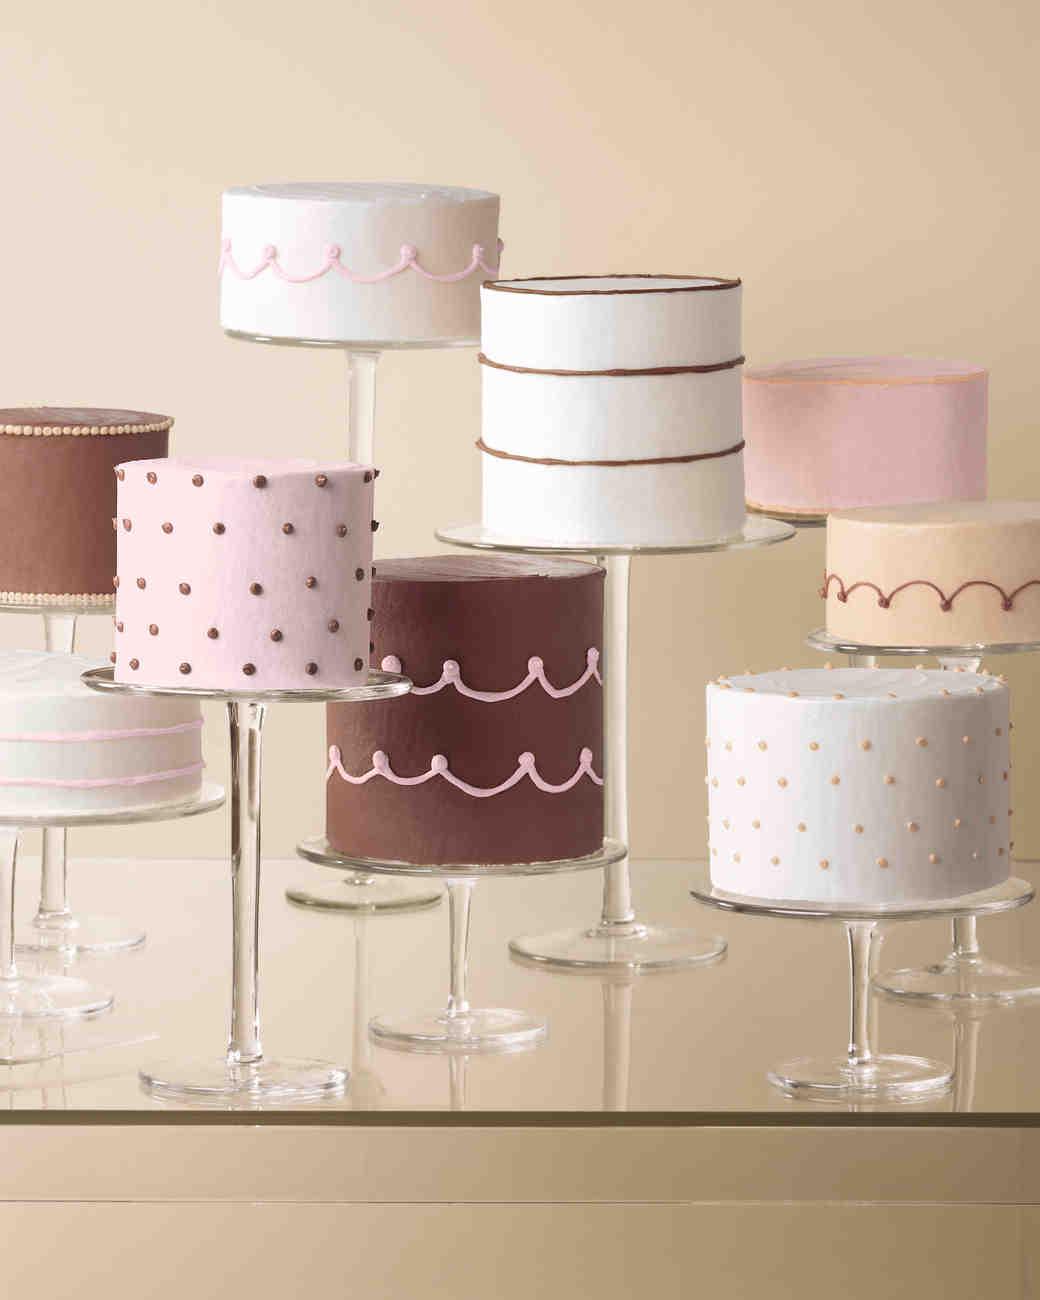 cakes-586-mwd110197.jpg